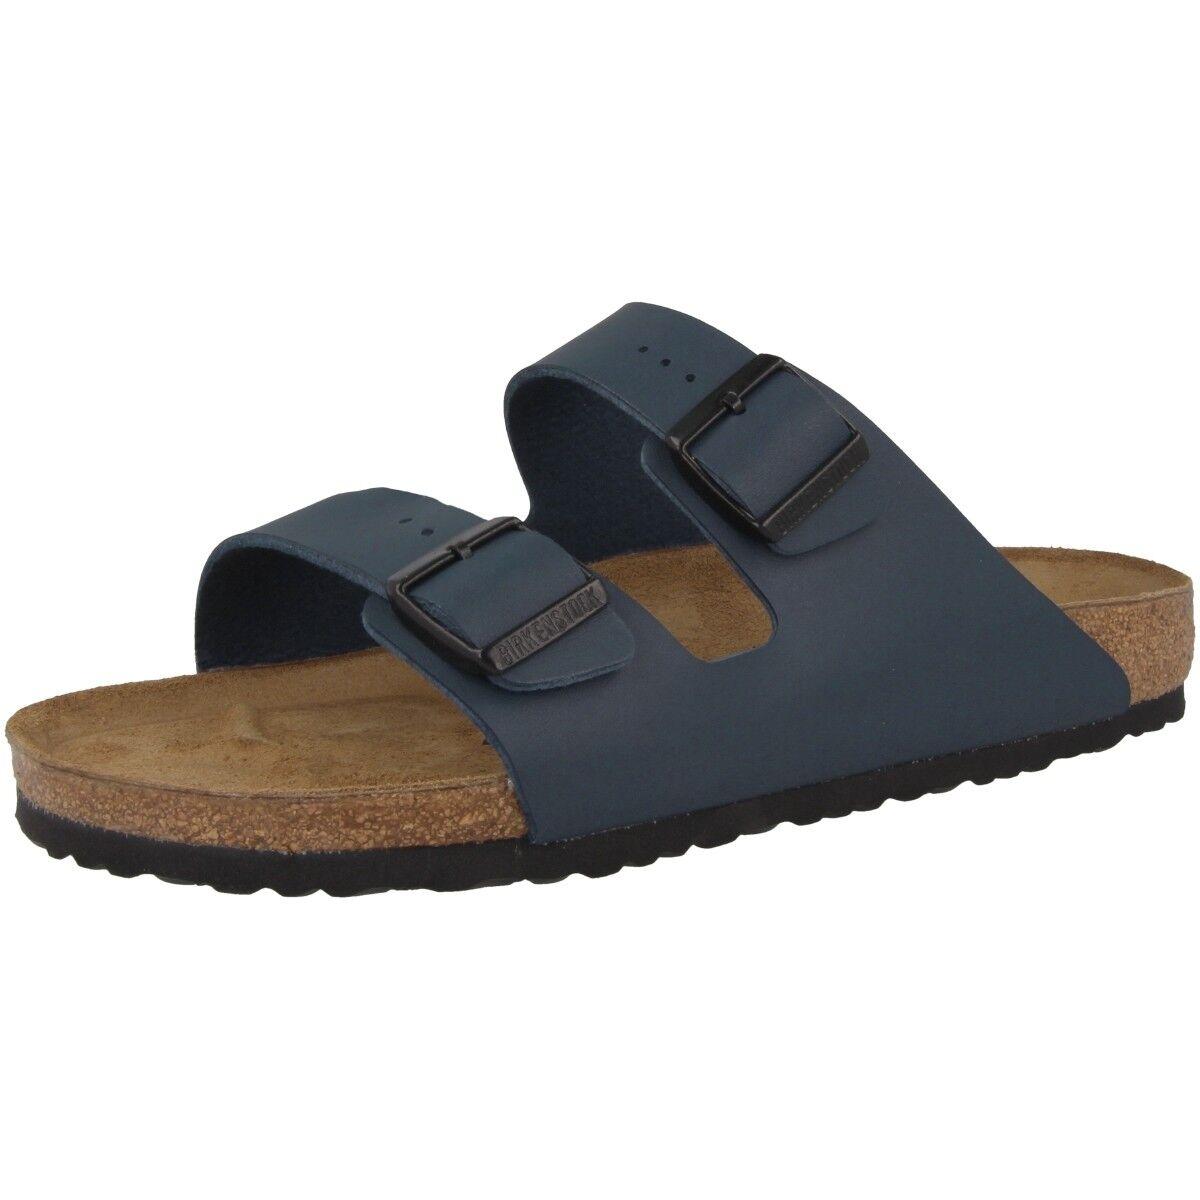 Birkenstock Arizona Birko-Flor Schuhe Blau 051751 Sandale Weite normal